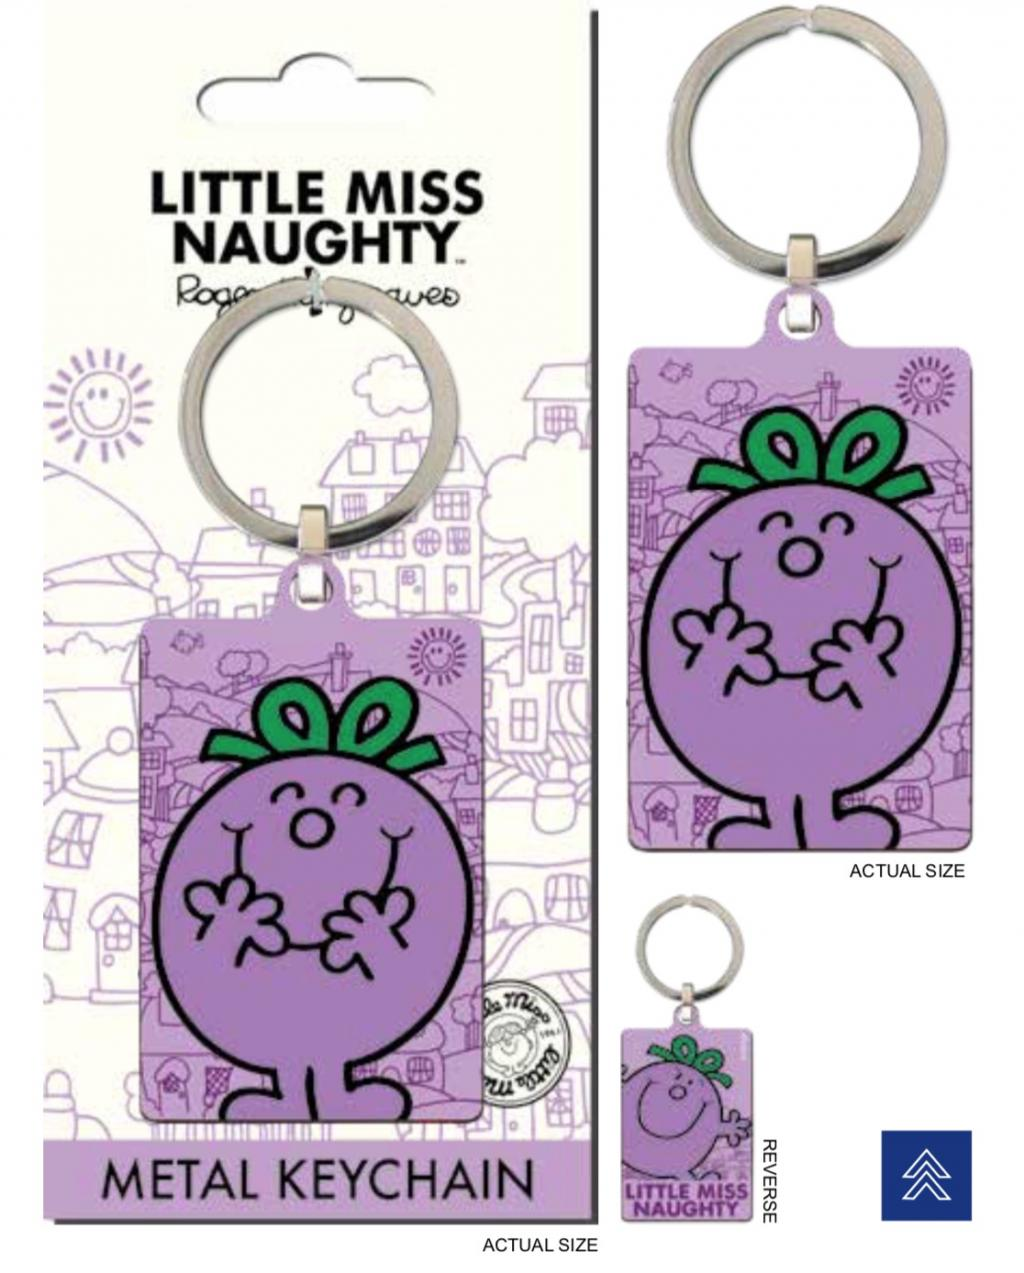 MR. MEN LITTLE MISS - Porte-Cles Metal - Little Miss Naughty